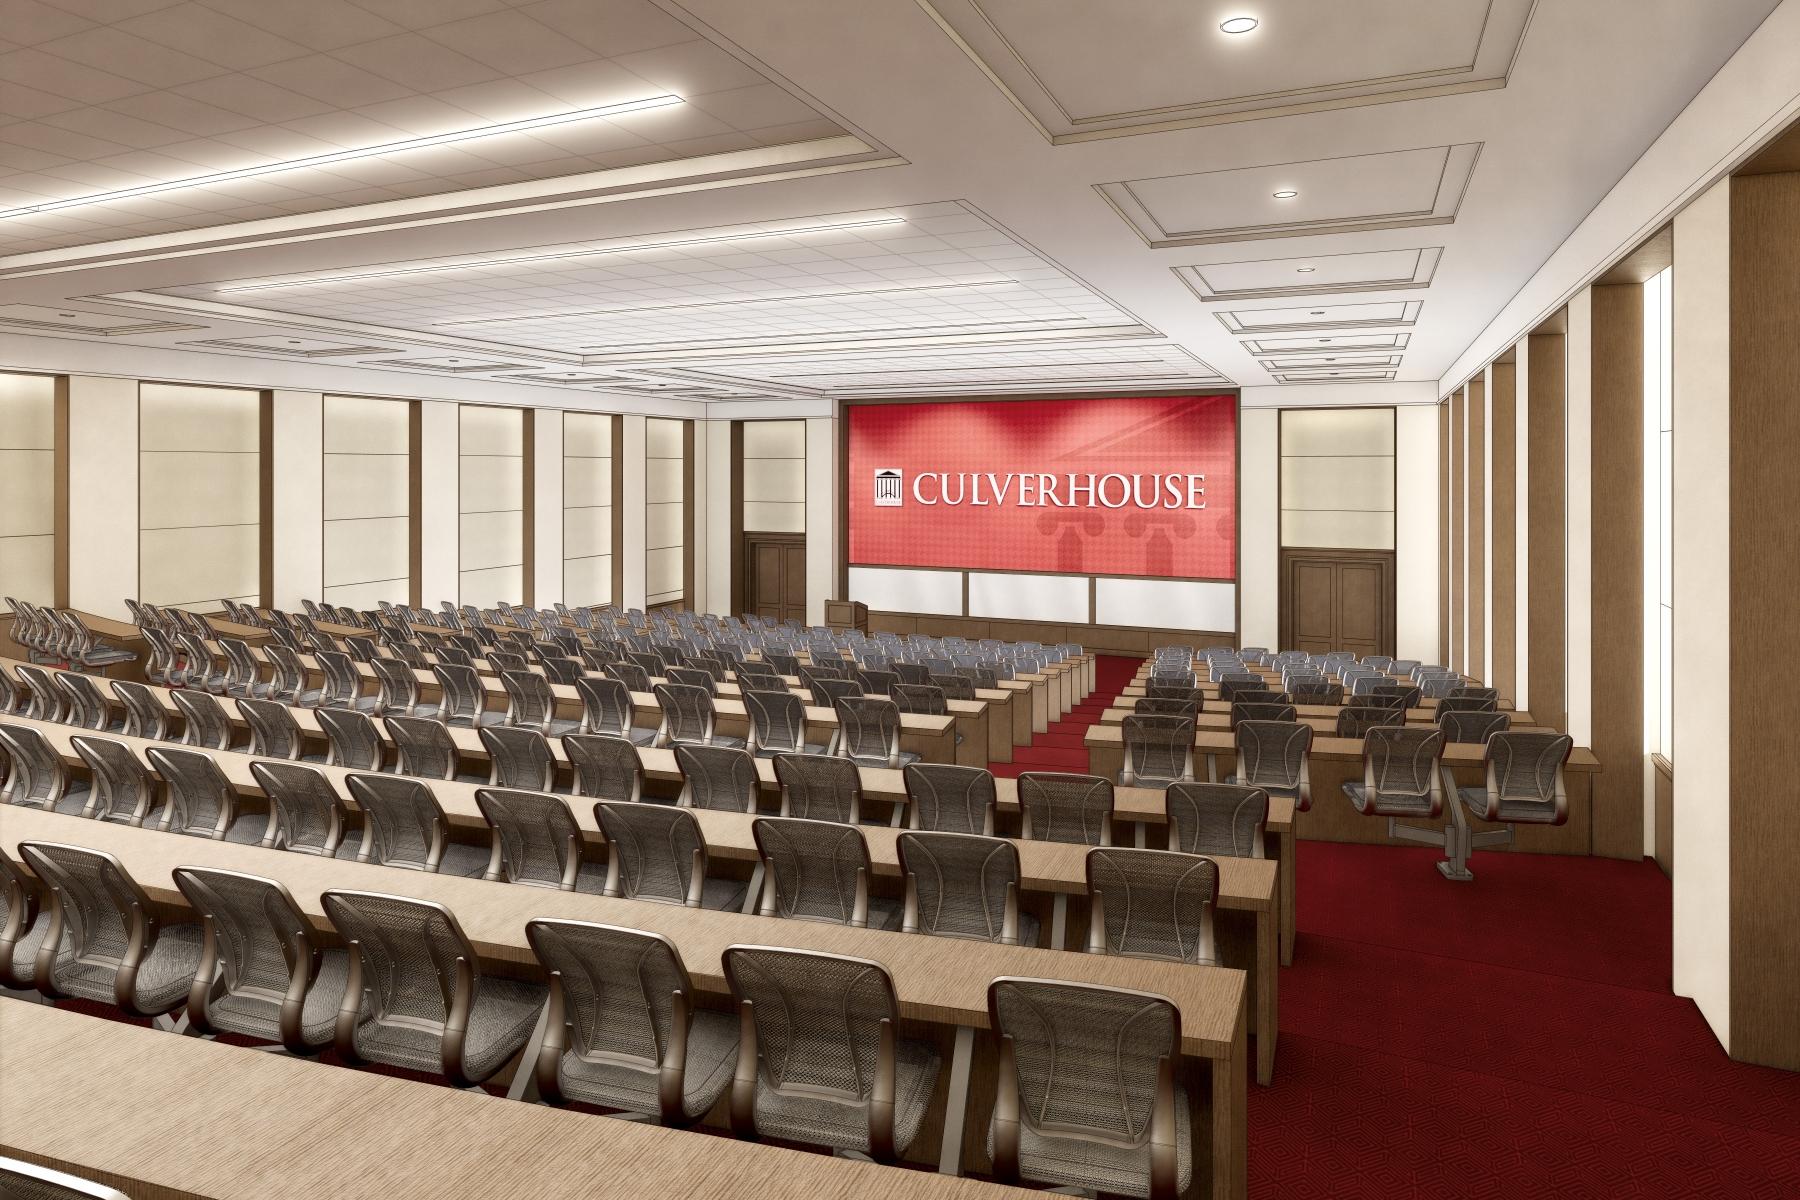 Interior_Lecture Hall